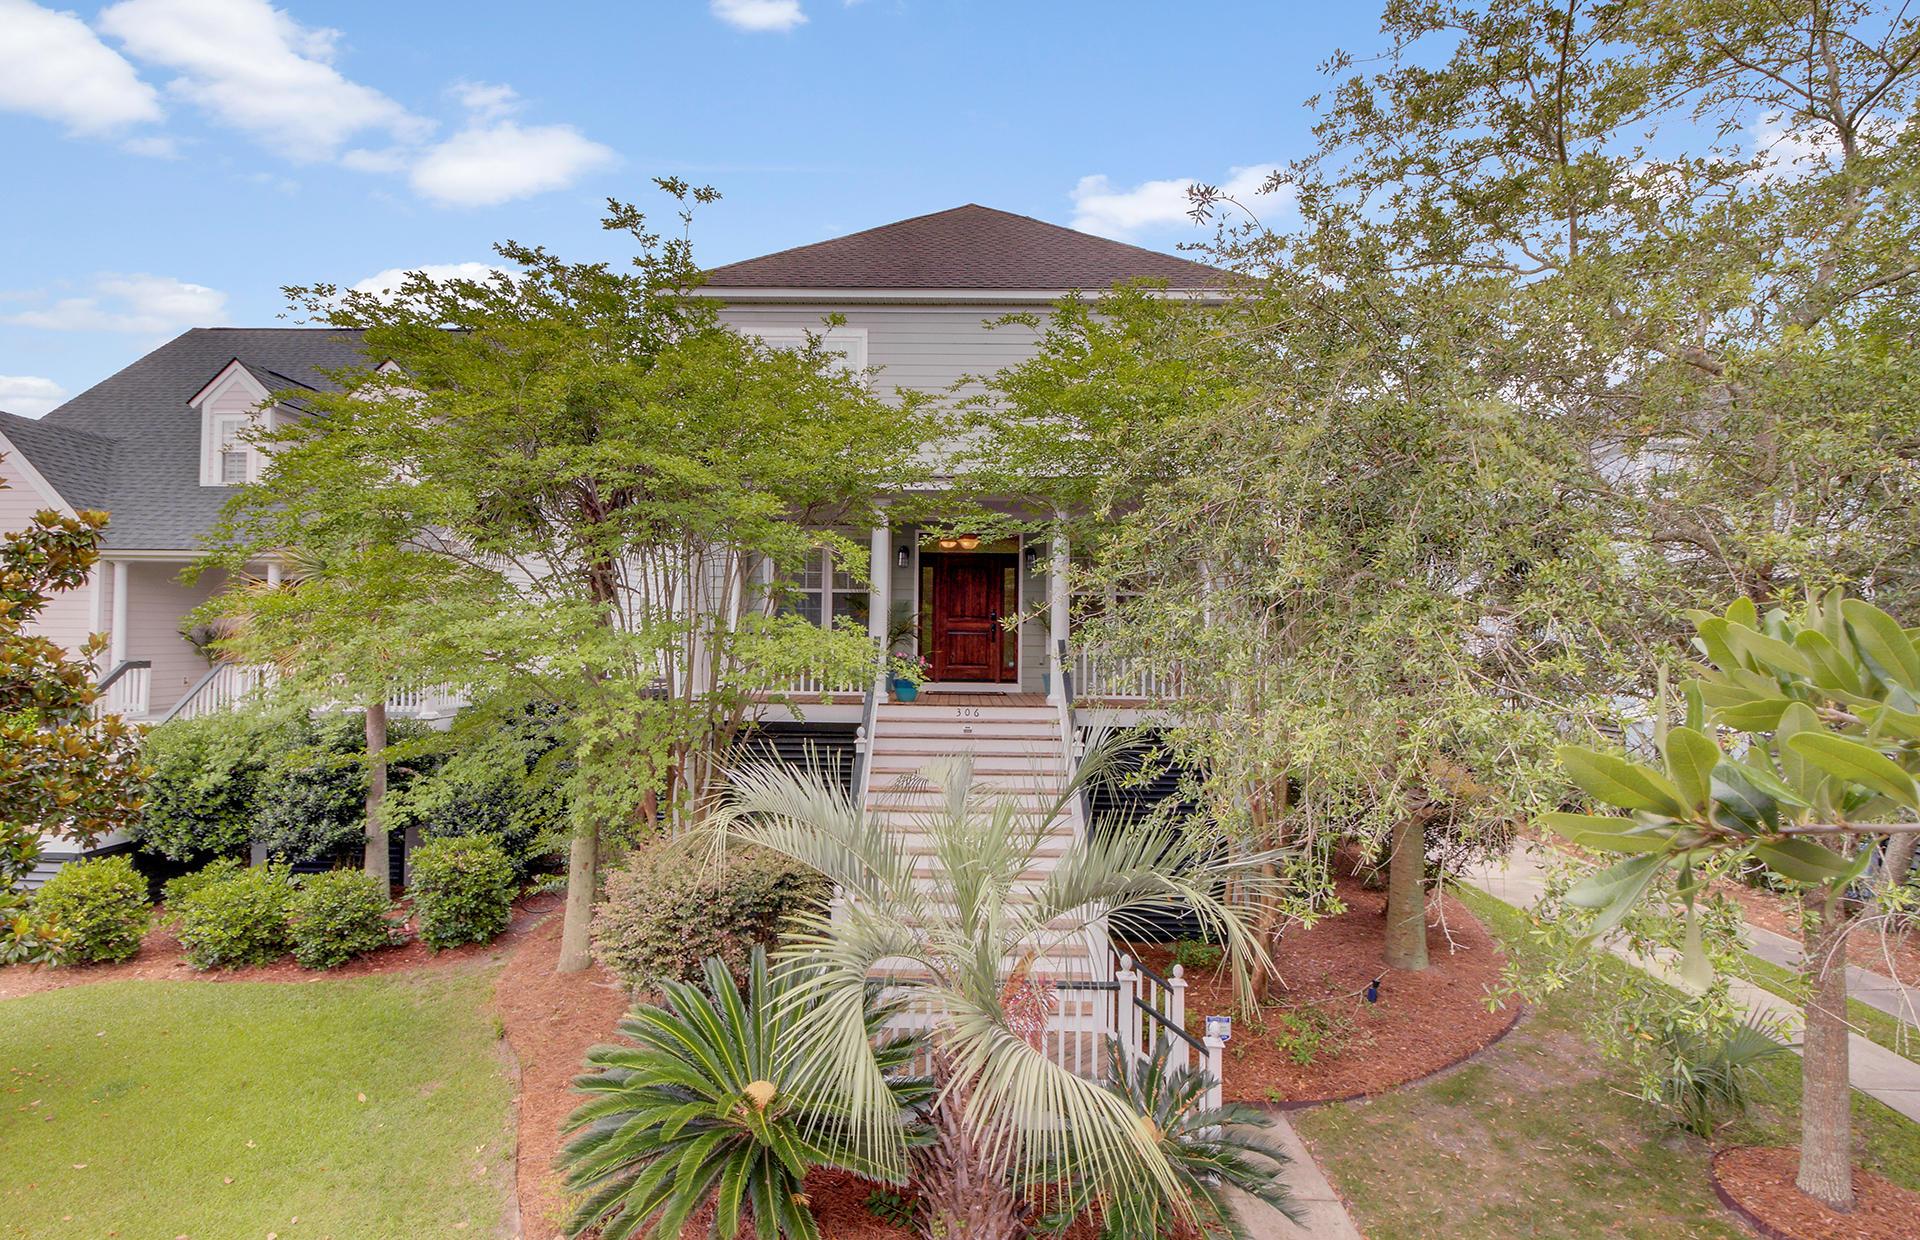 Daniel Island Homes For Sale - 306 Ladd, Charleston, SC - 0